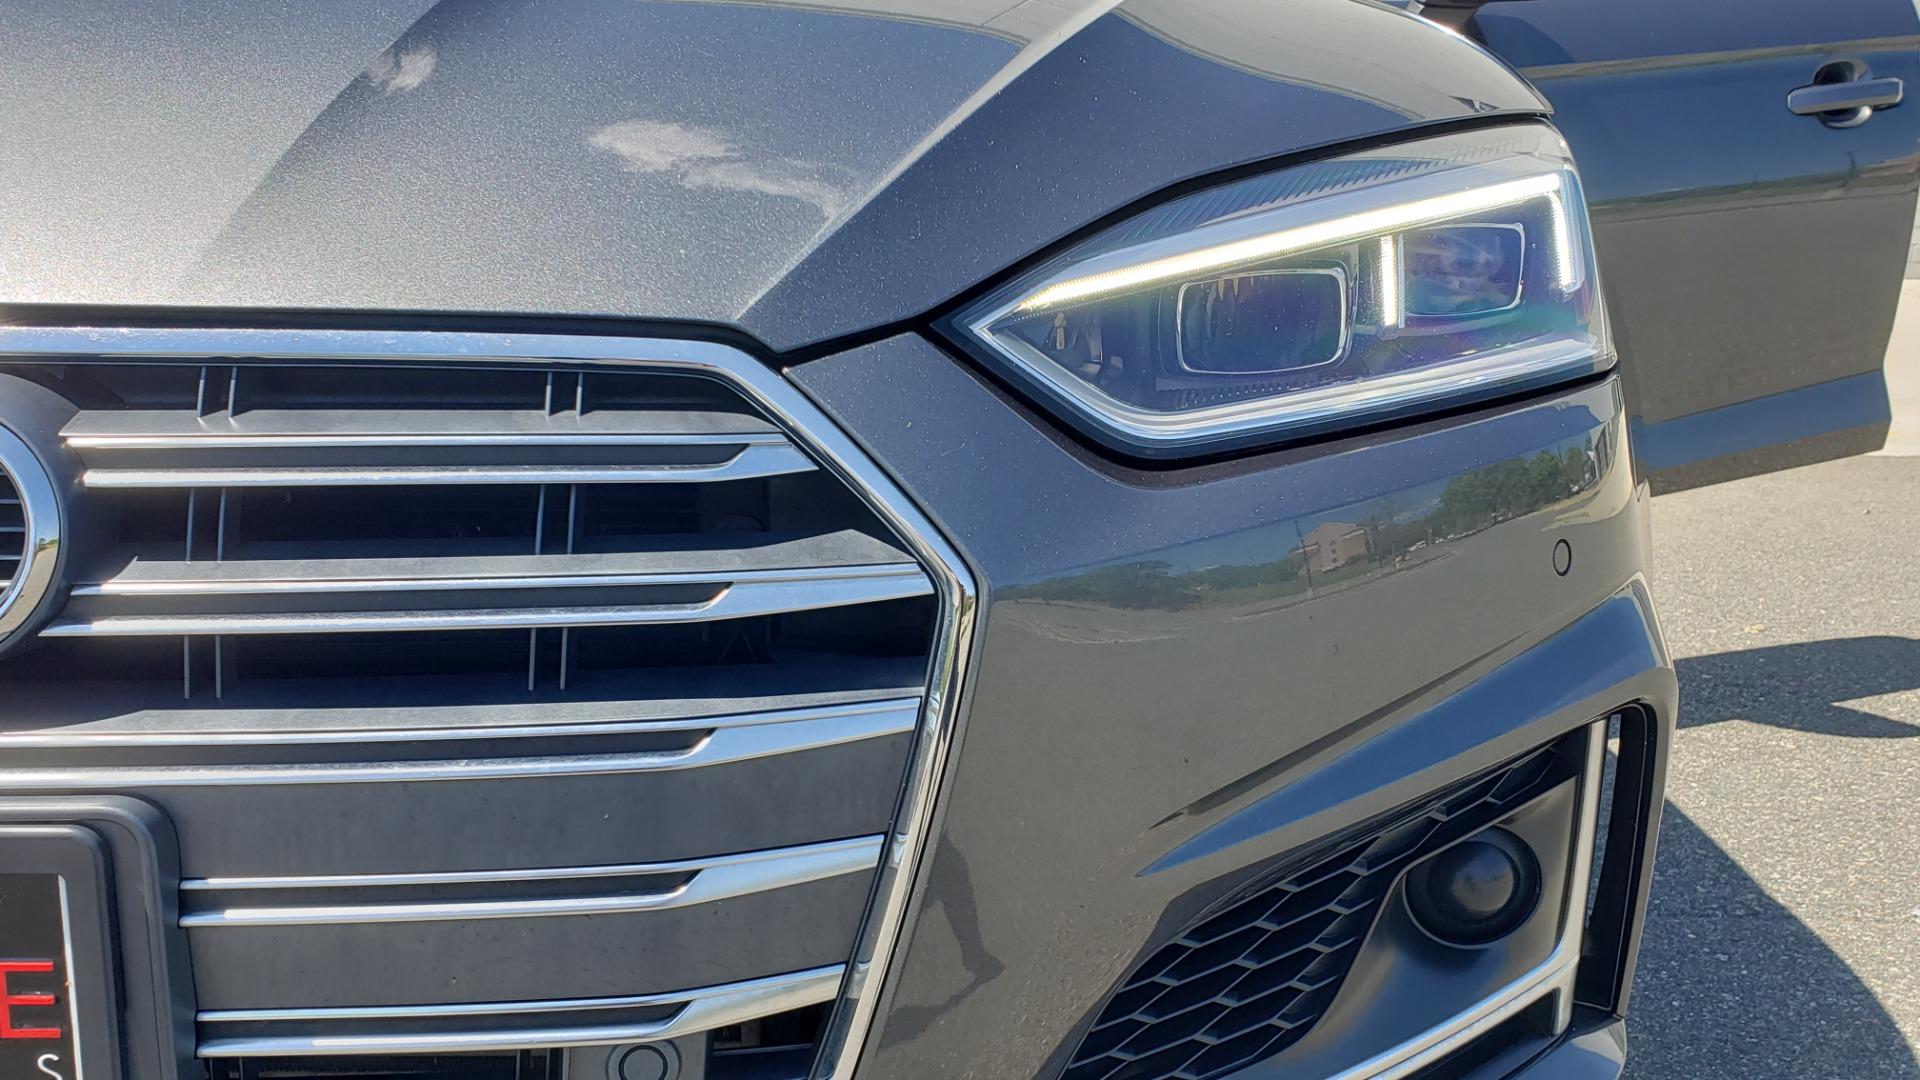 Used 2018 Audi S5 SPORTBACK PRESTIGE S-SPORT / NAV / SUNROOF / HUD / B&O SND / REARVIEW for sale $48,995 at Formula Imports in Charlotte NC 28227 23